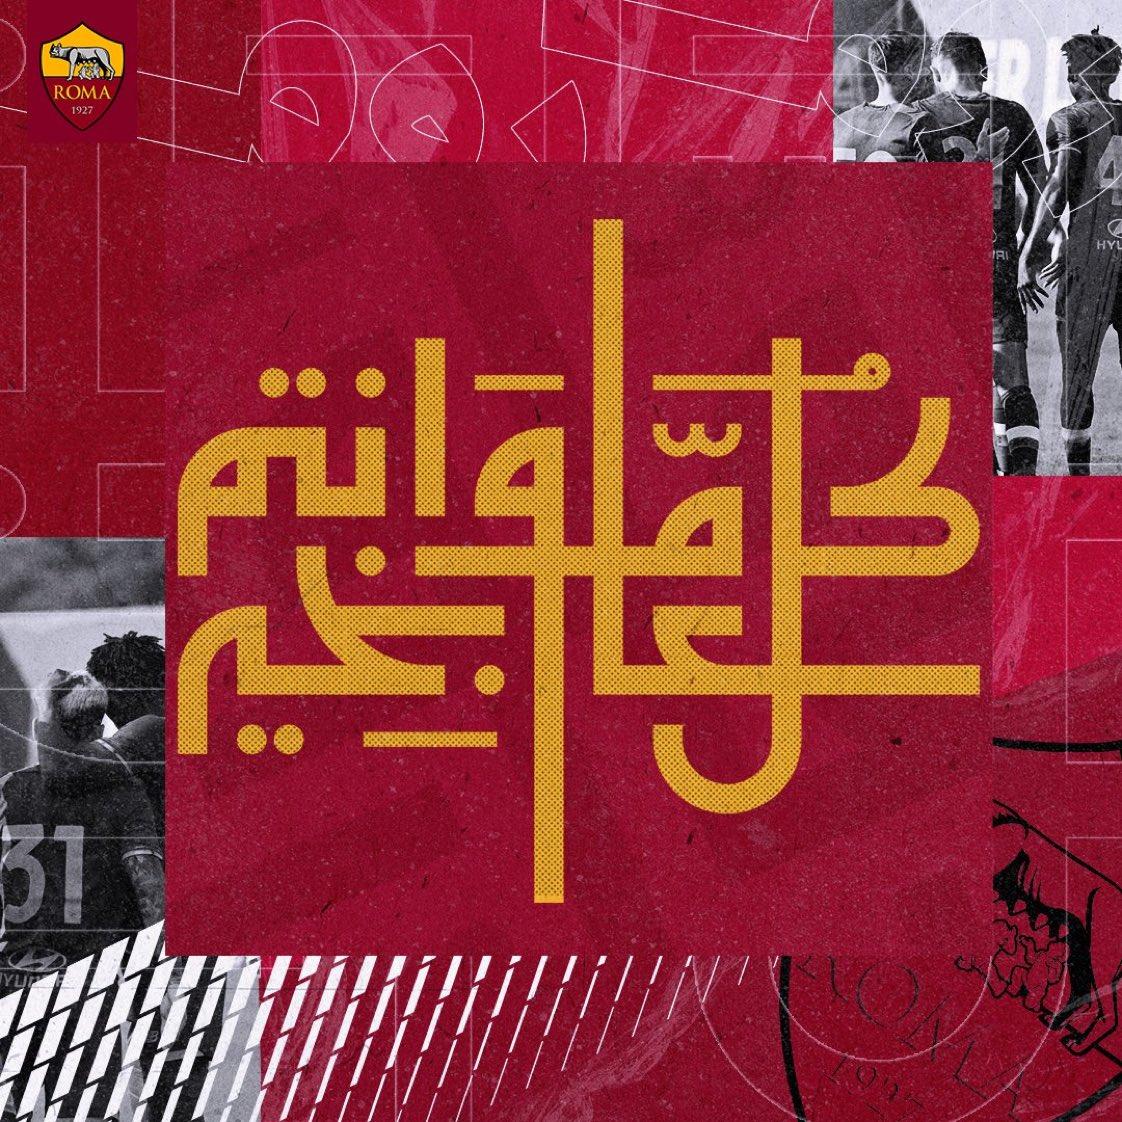 Wishing a happy #EidAlAdha to those celebrating around the world.     #EidMubarak to all! https://t.co/XZxxZigT0S